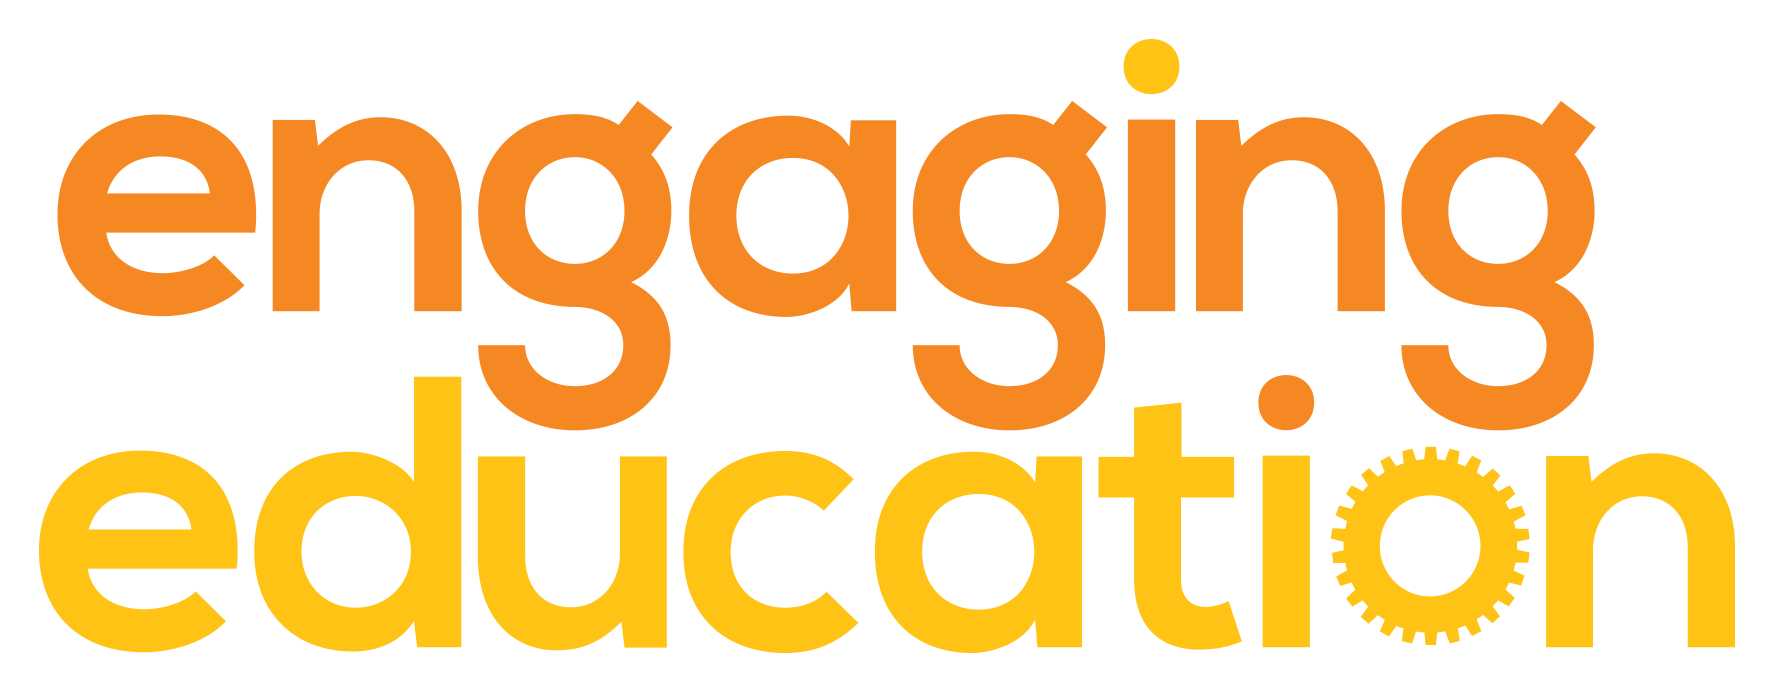 Engaging Education logo.png